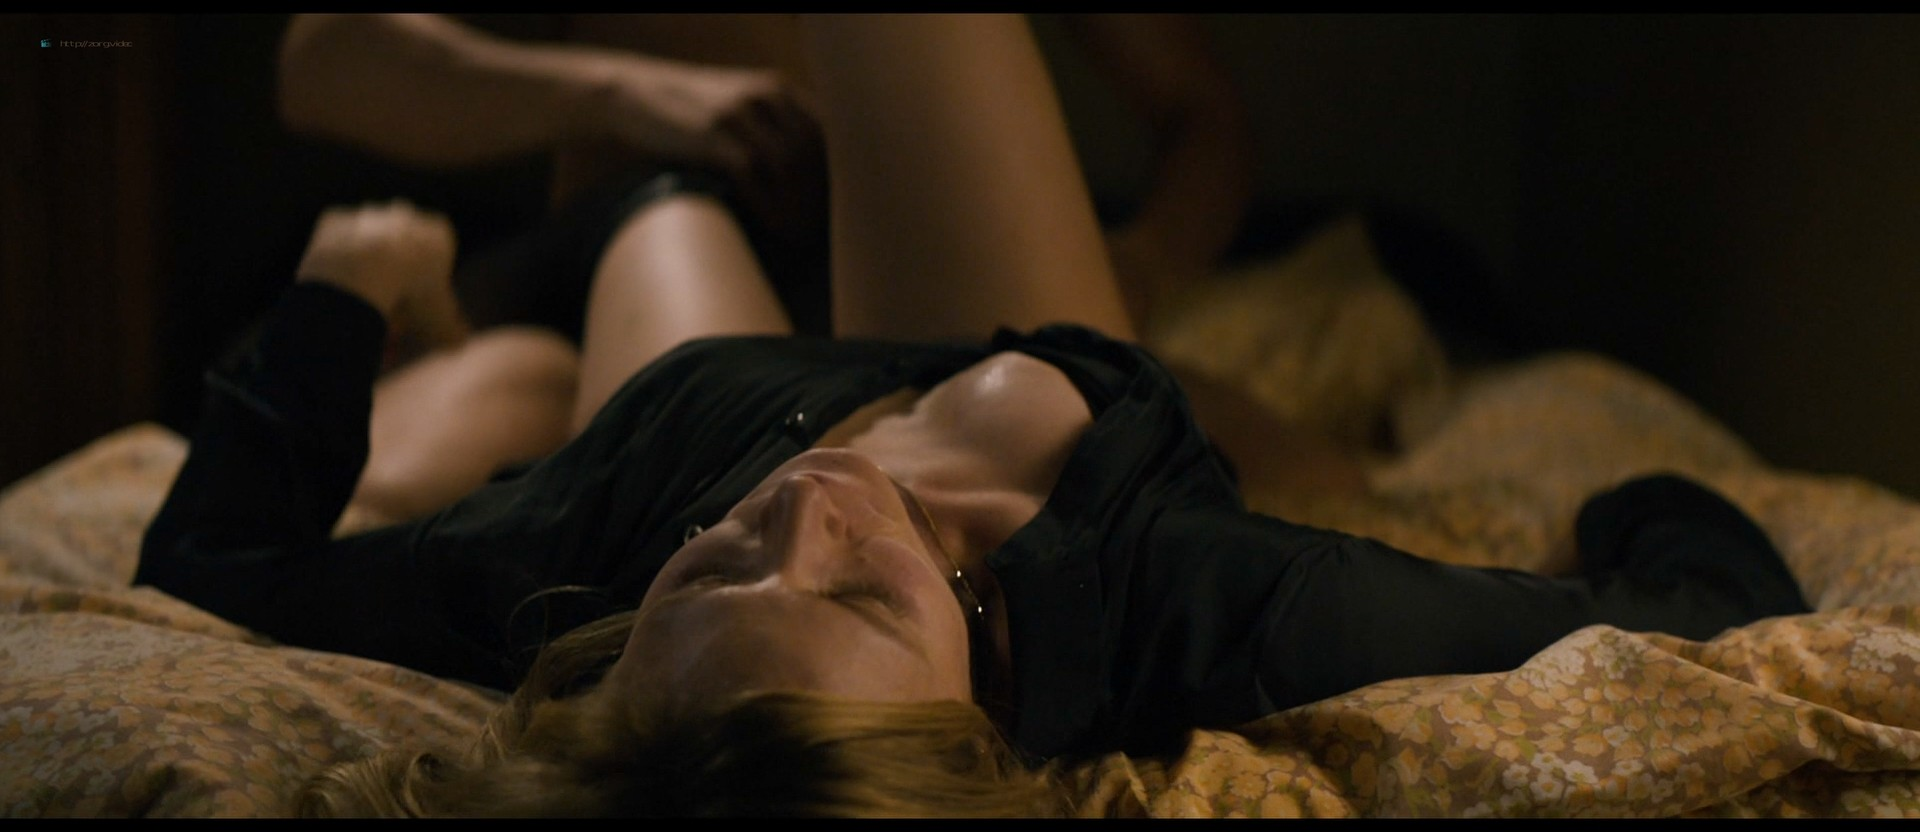 Julia Jentsch nude topless Luise Heyer nude - Auf Einmal (2016) HD 1080p Web (8)